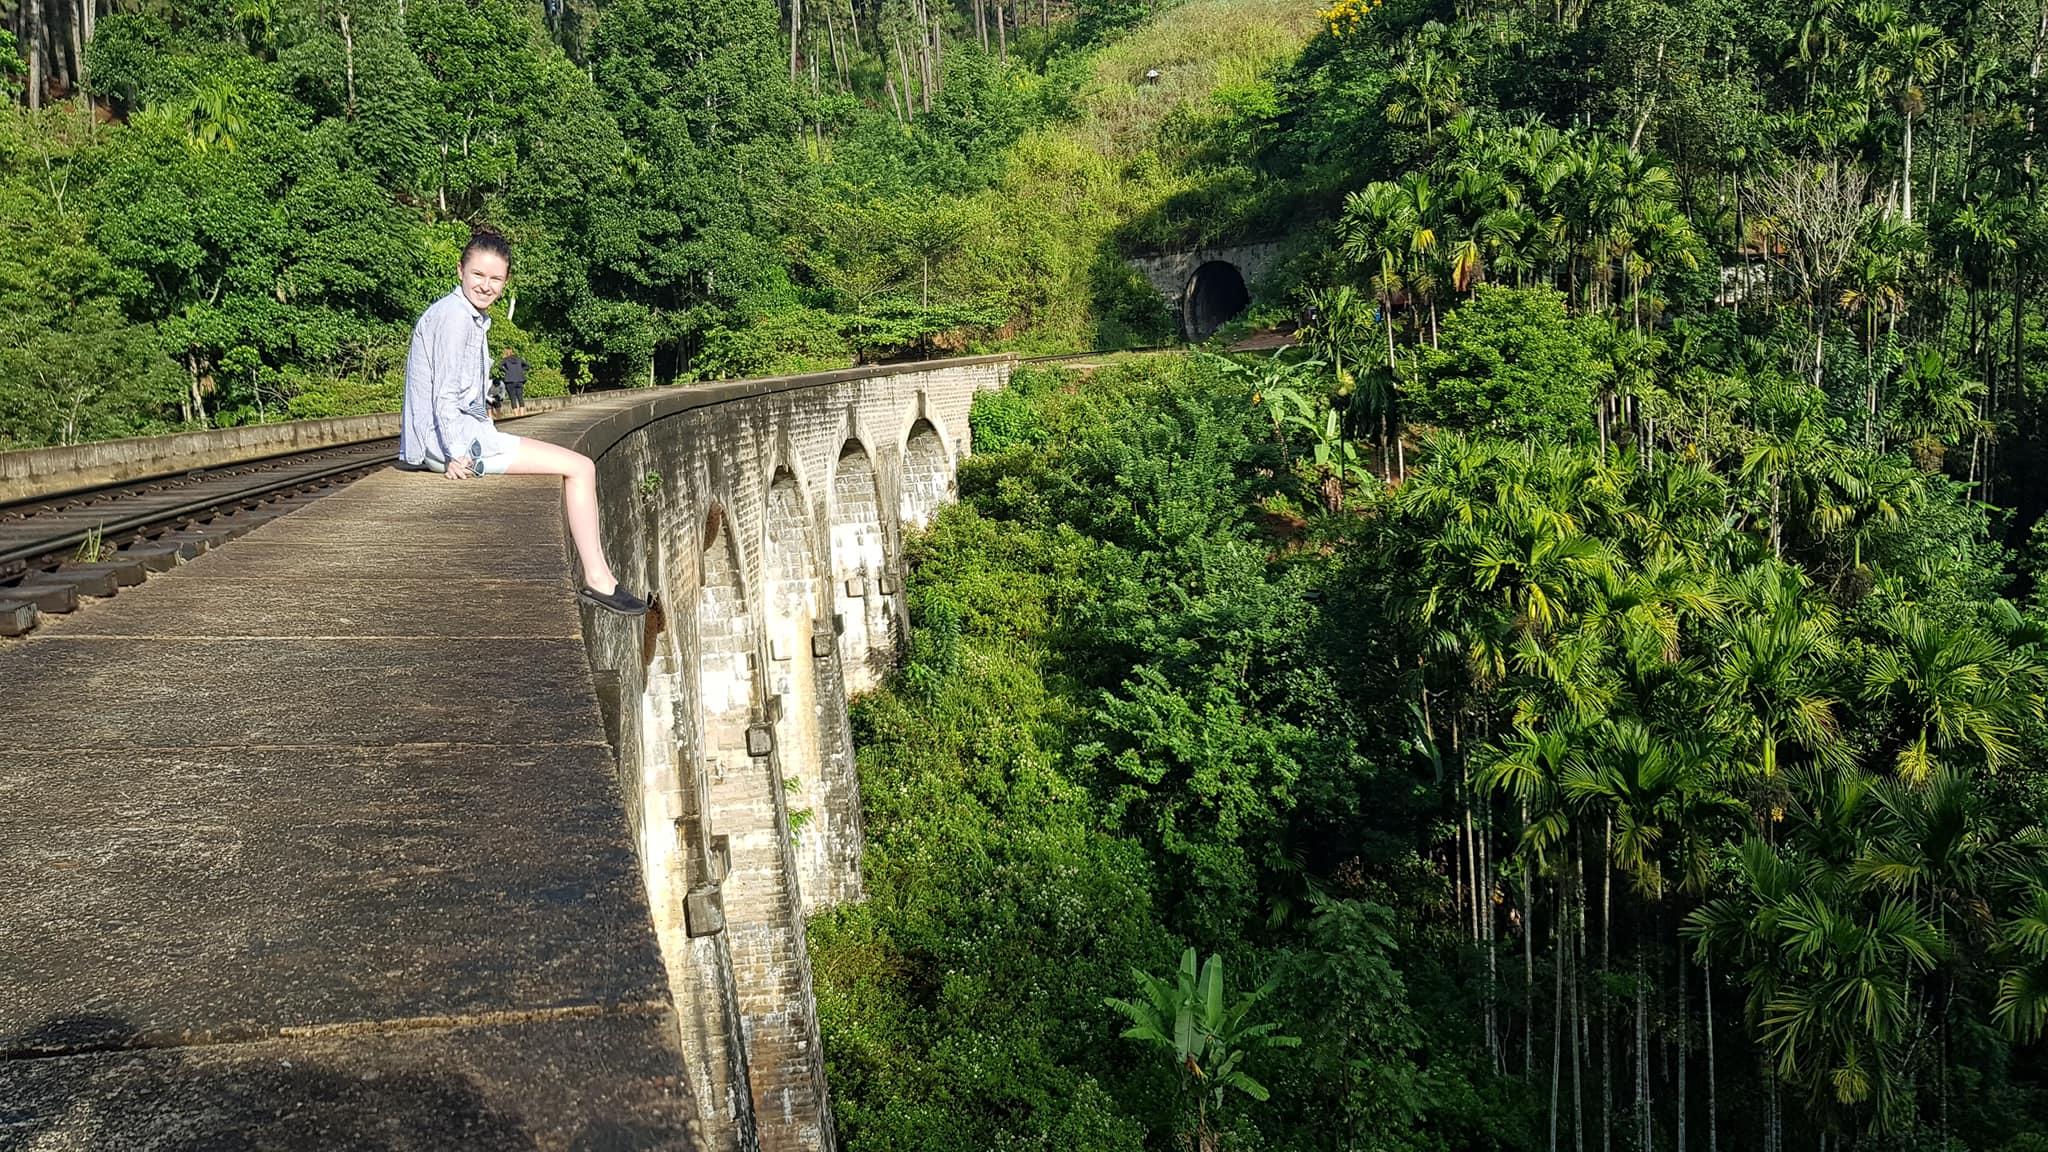 invite-to-paradise-sri-lanka-maldives-holiday-honeymoon-specialists-customer-guest-feedback-zane-lisa-butcher-98-acres-tea-plantation-nine-arch-bridge-sitting.jpg